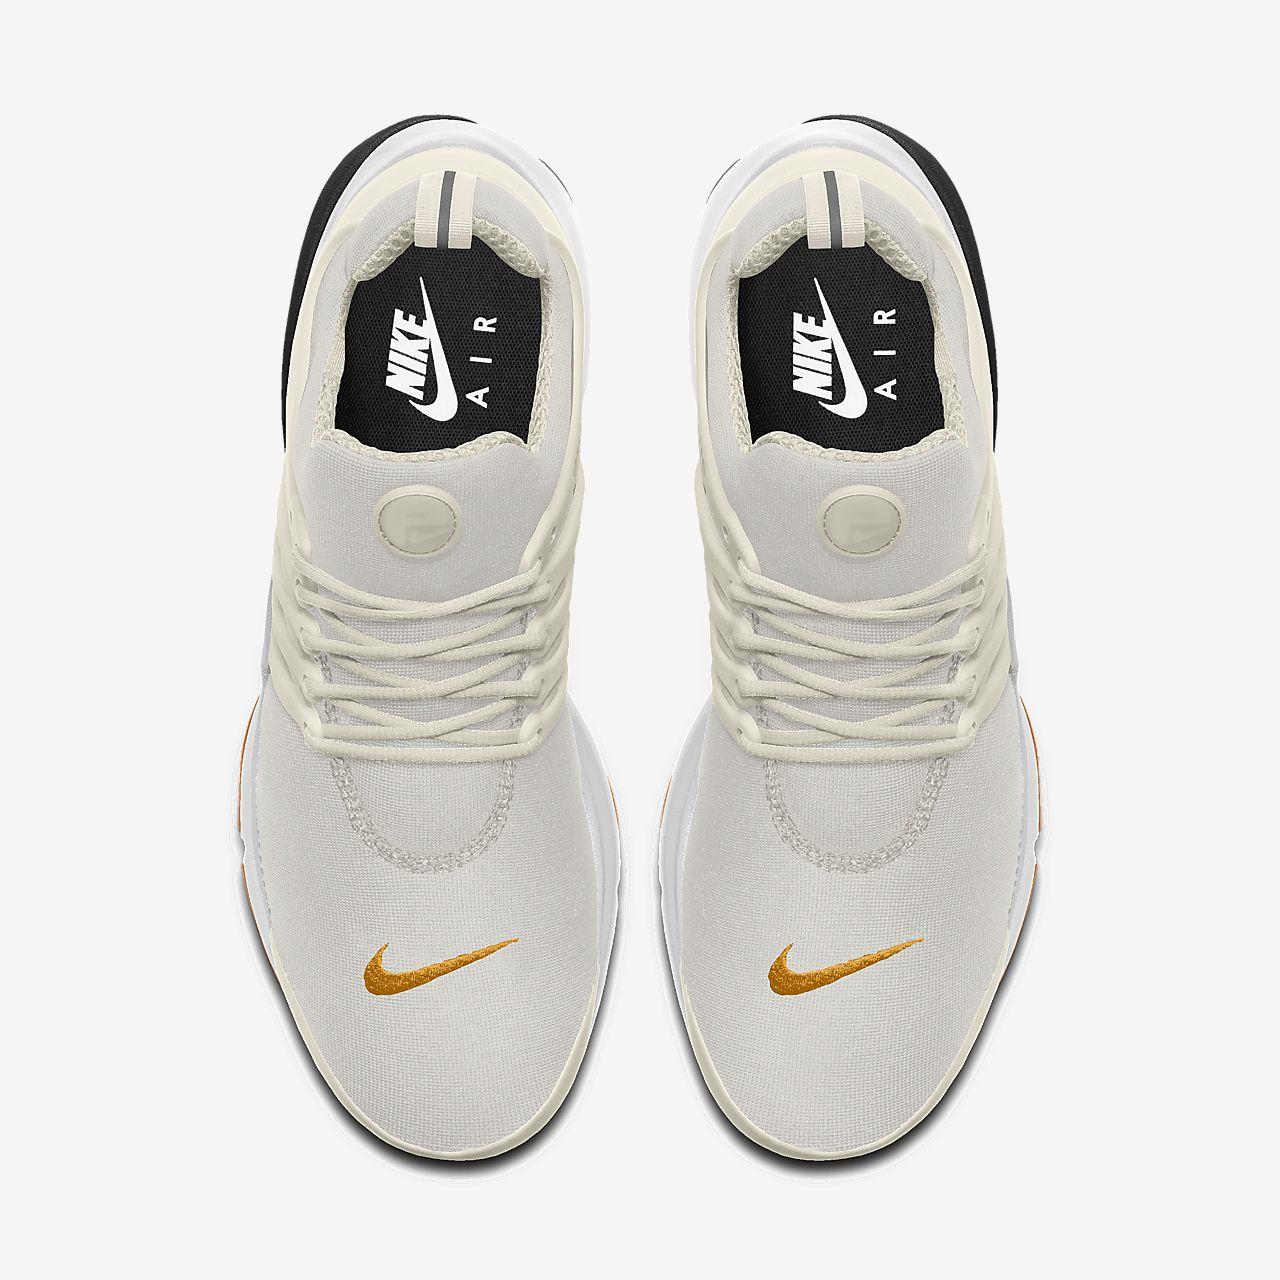 Buy Nike Free Nike Shoes Nike Air Presto Women Sale At A Low